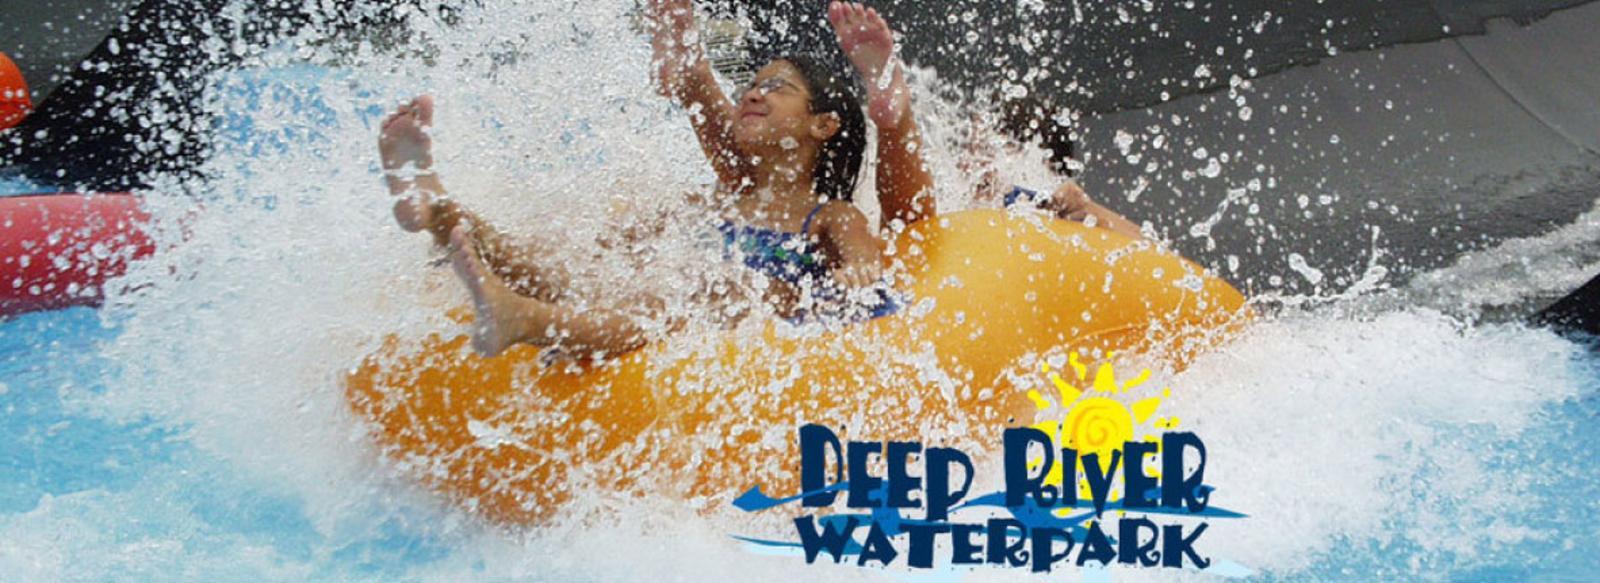 NSA-Deep-River-Waterpark-night